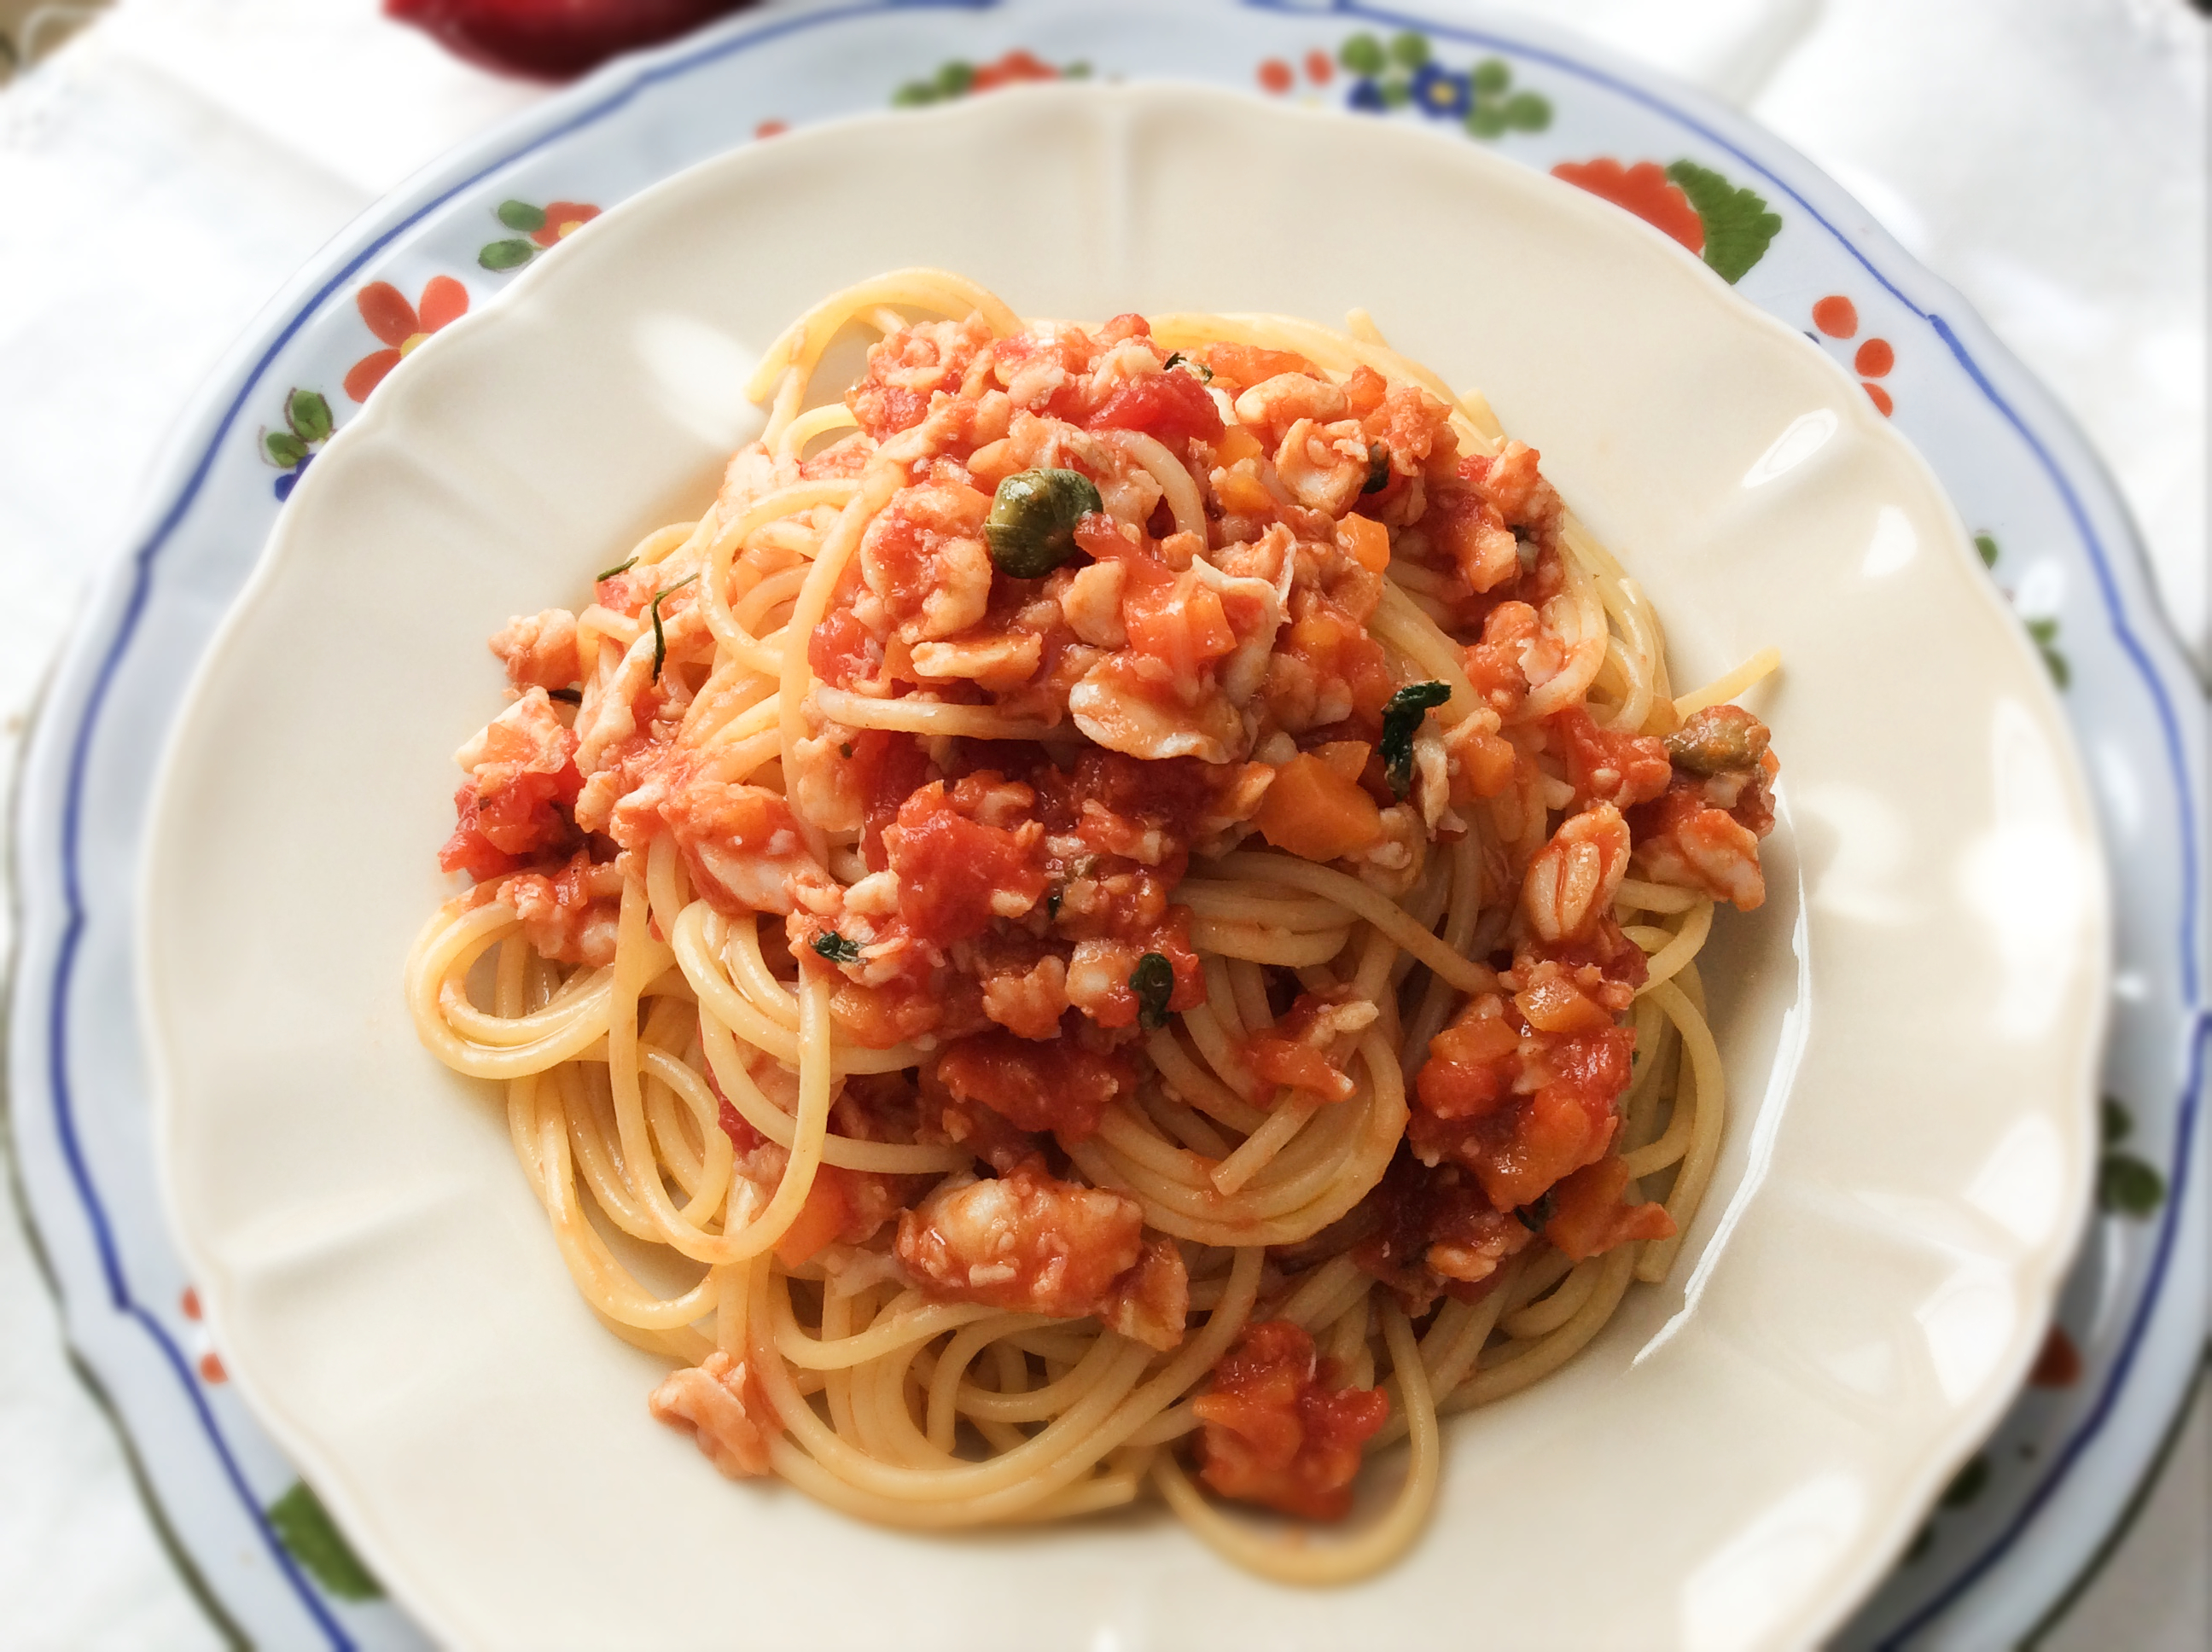 bf_1_mirna_rossi_pasta_cod_sauce_foshsauce